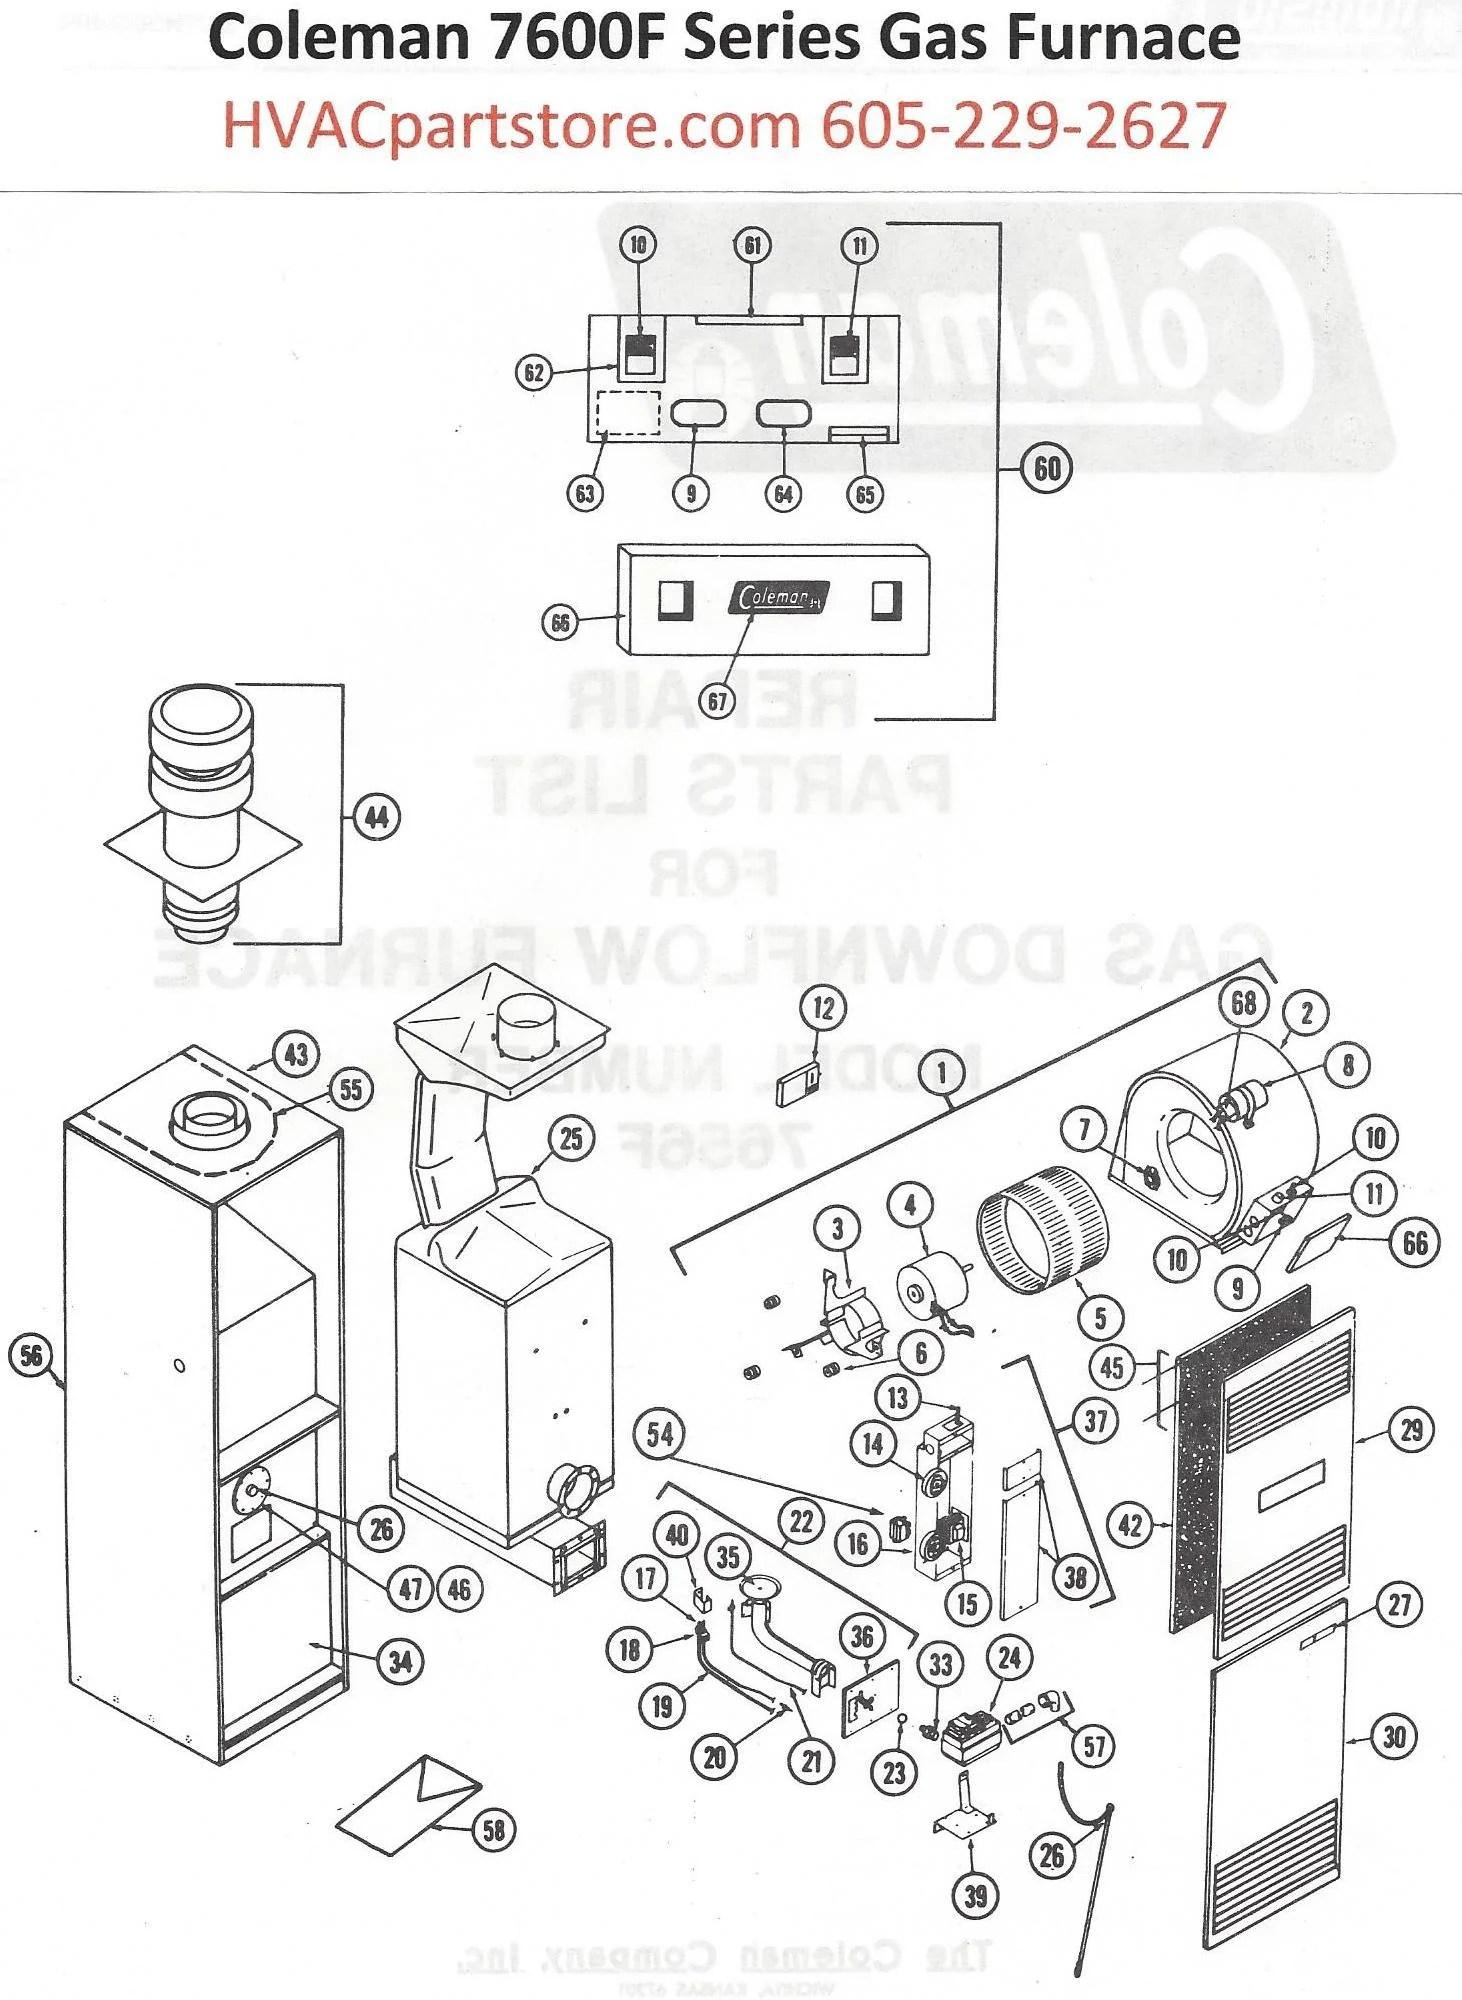 7656F856 Coleman Gas Furnace Parts – HVACpartstore